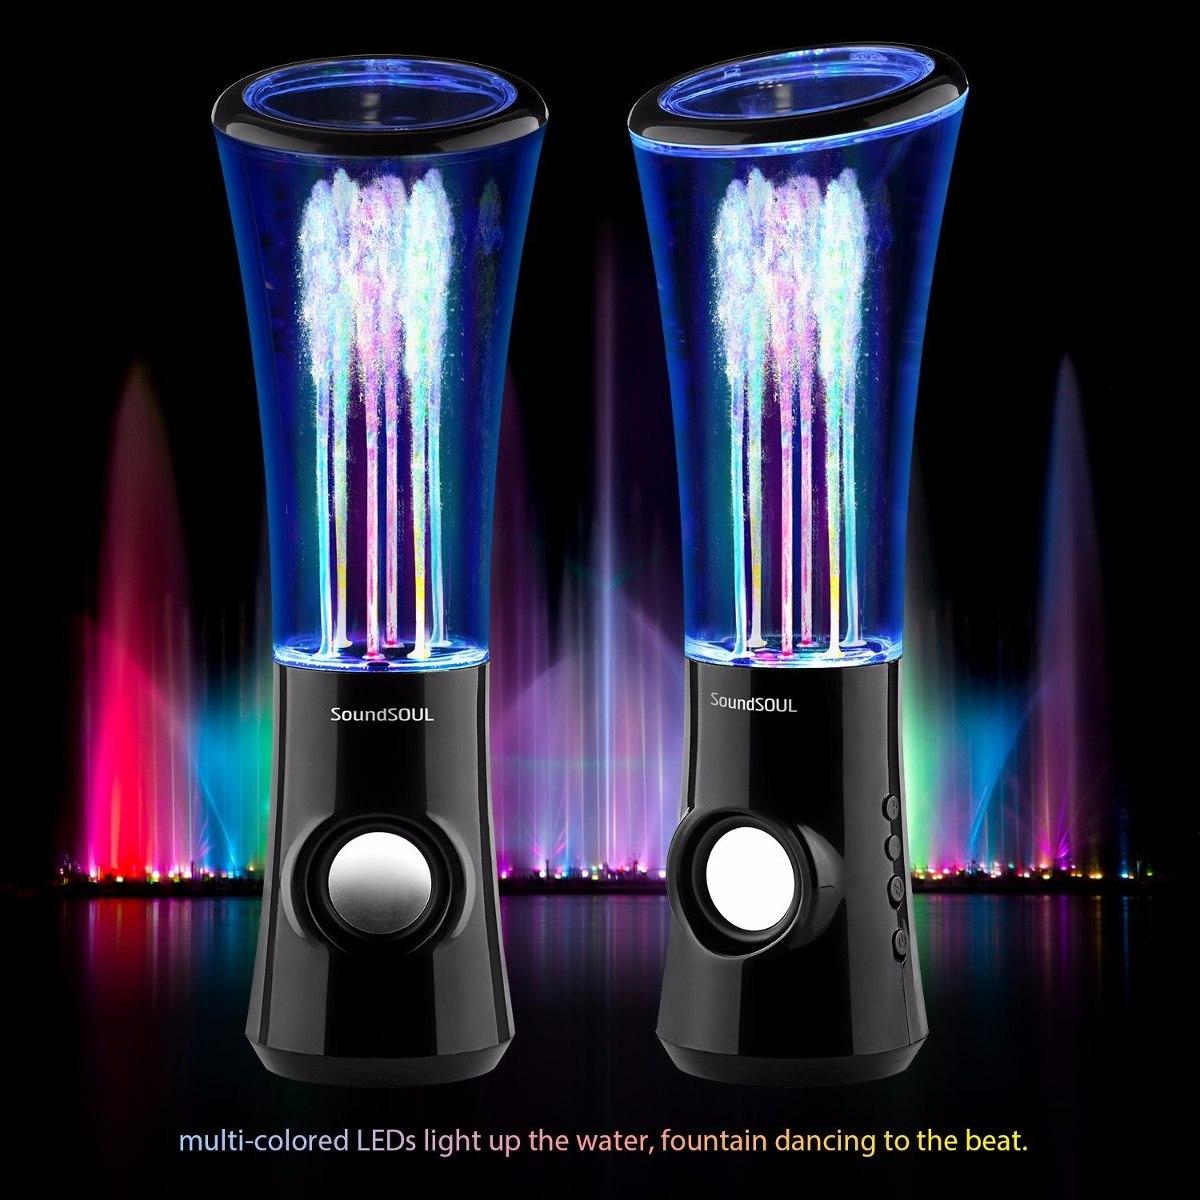 Bocinas Con Fuente De Agua Mini 6 Luces De Colores Led